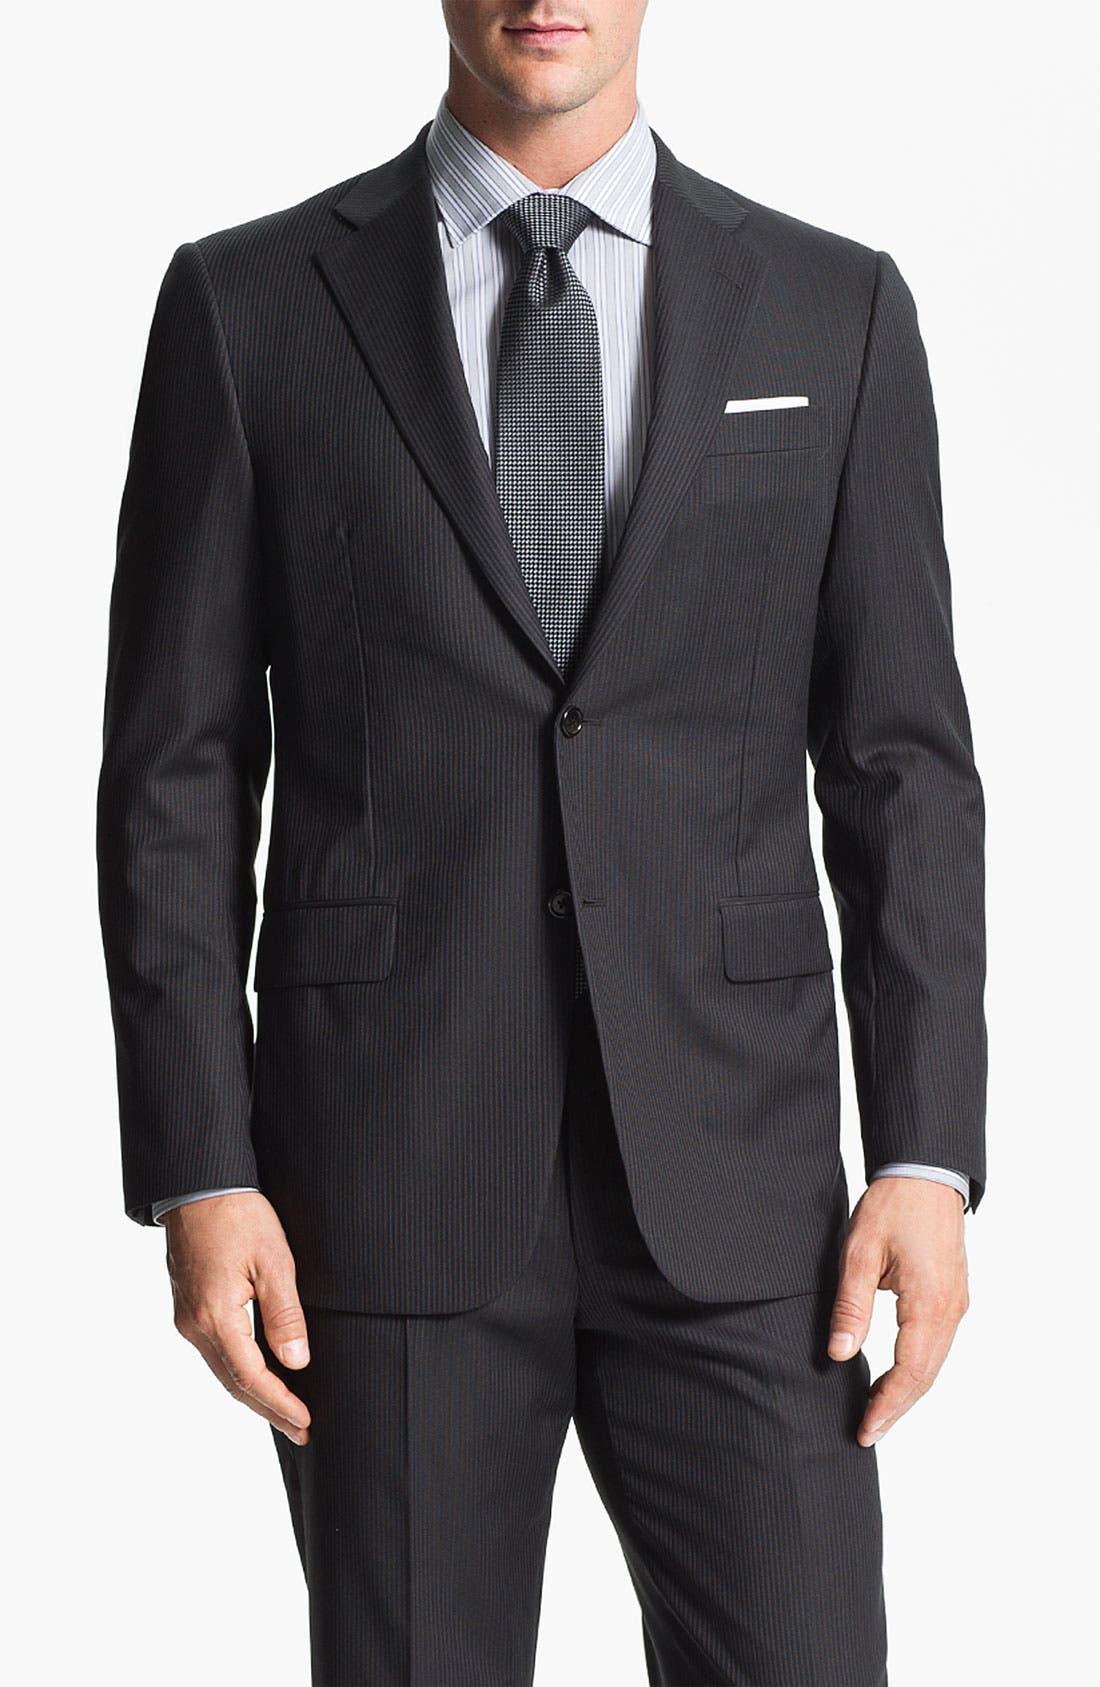 Alternate Image 1 Selected - Hickey Freeman 'Beacon' Stripe Wool Suit